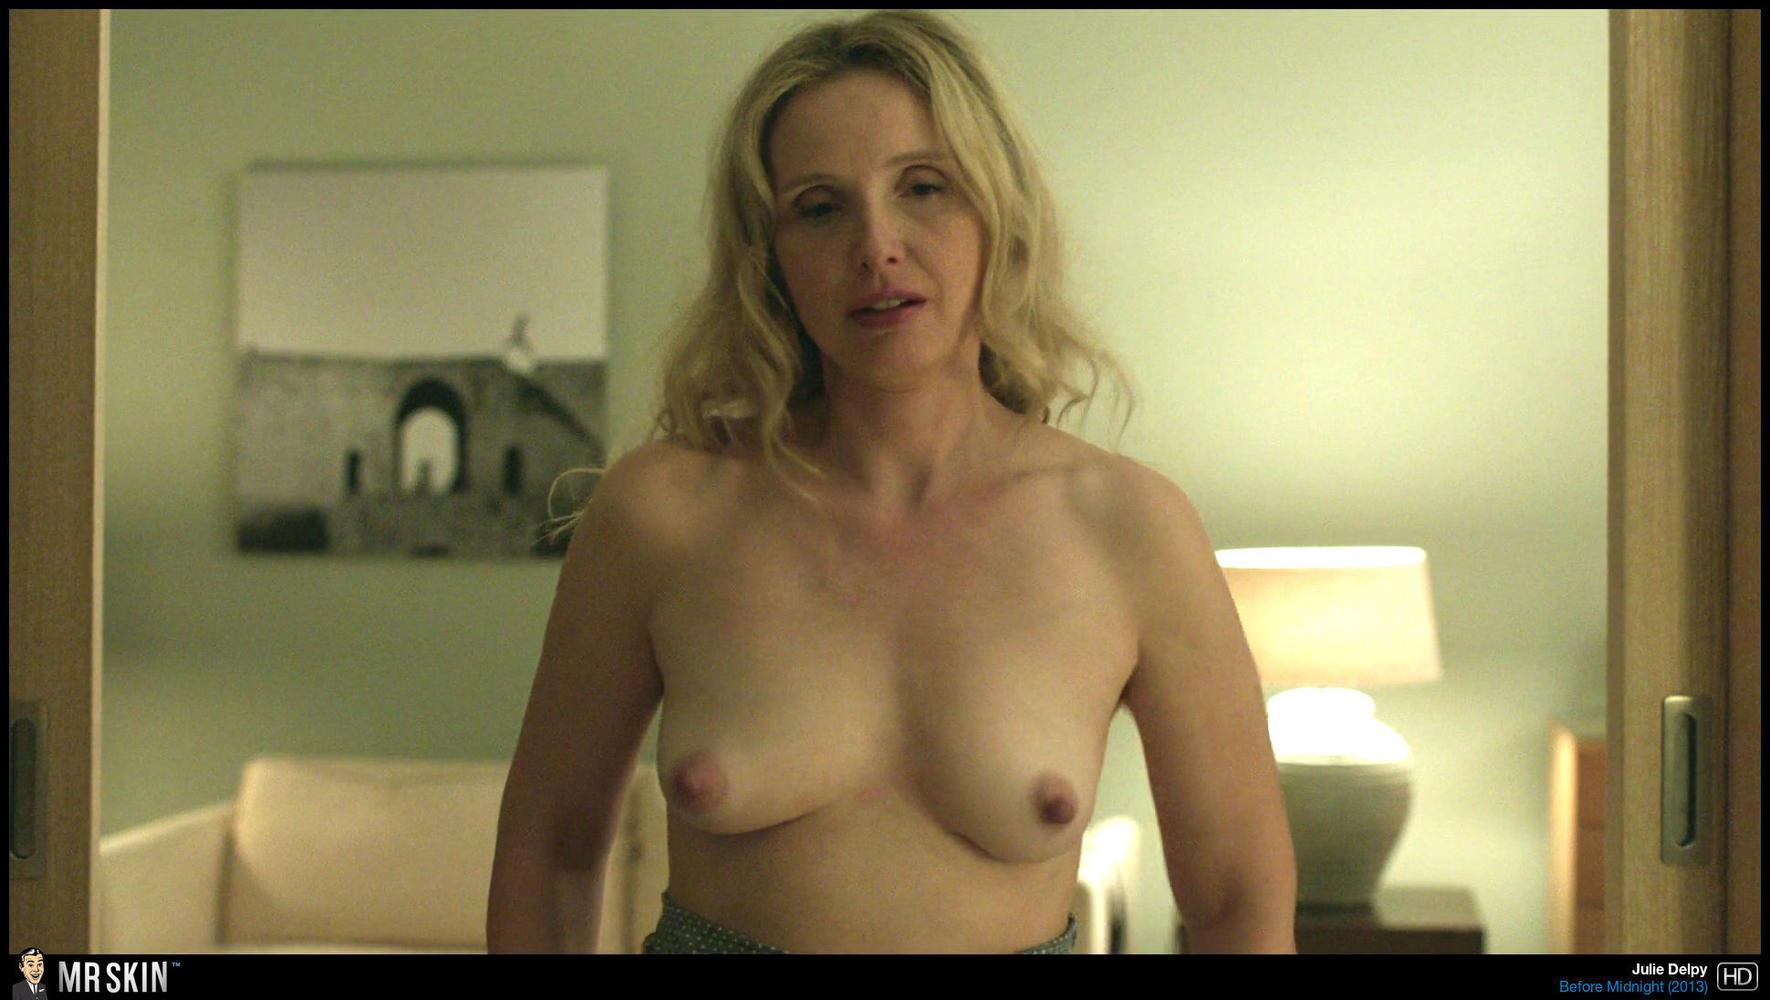 julie delpy hot desnuda